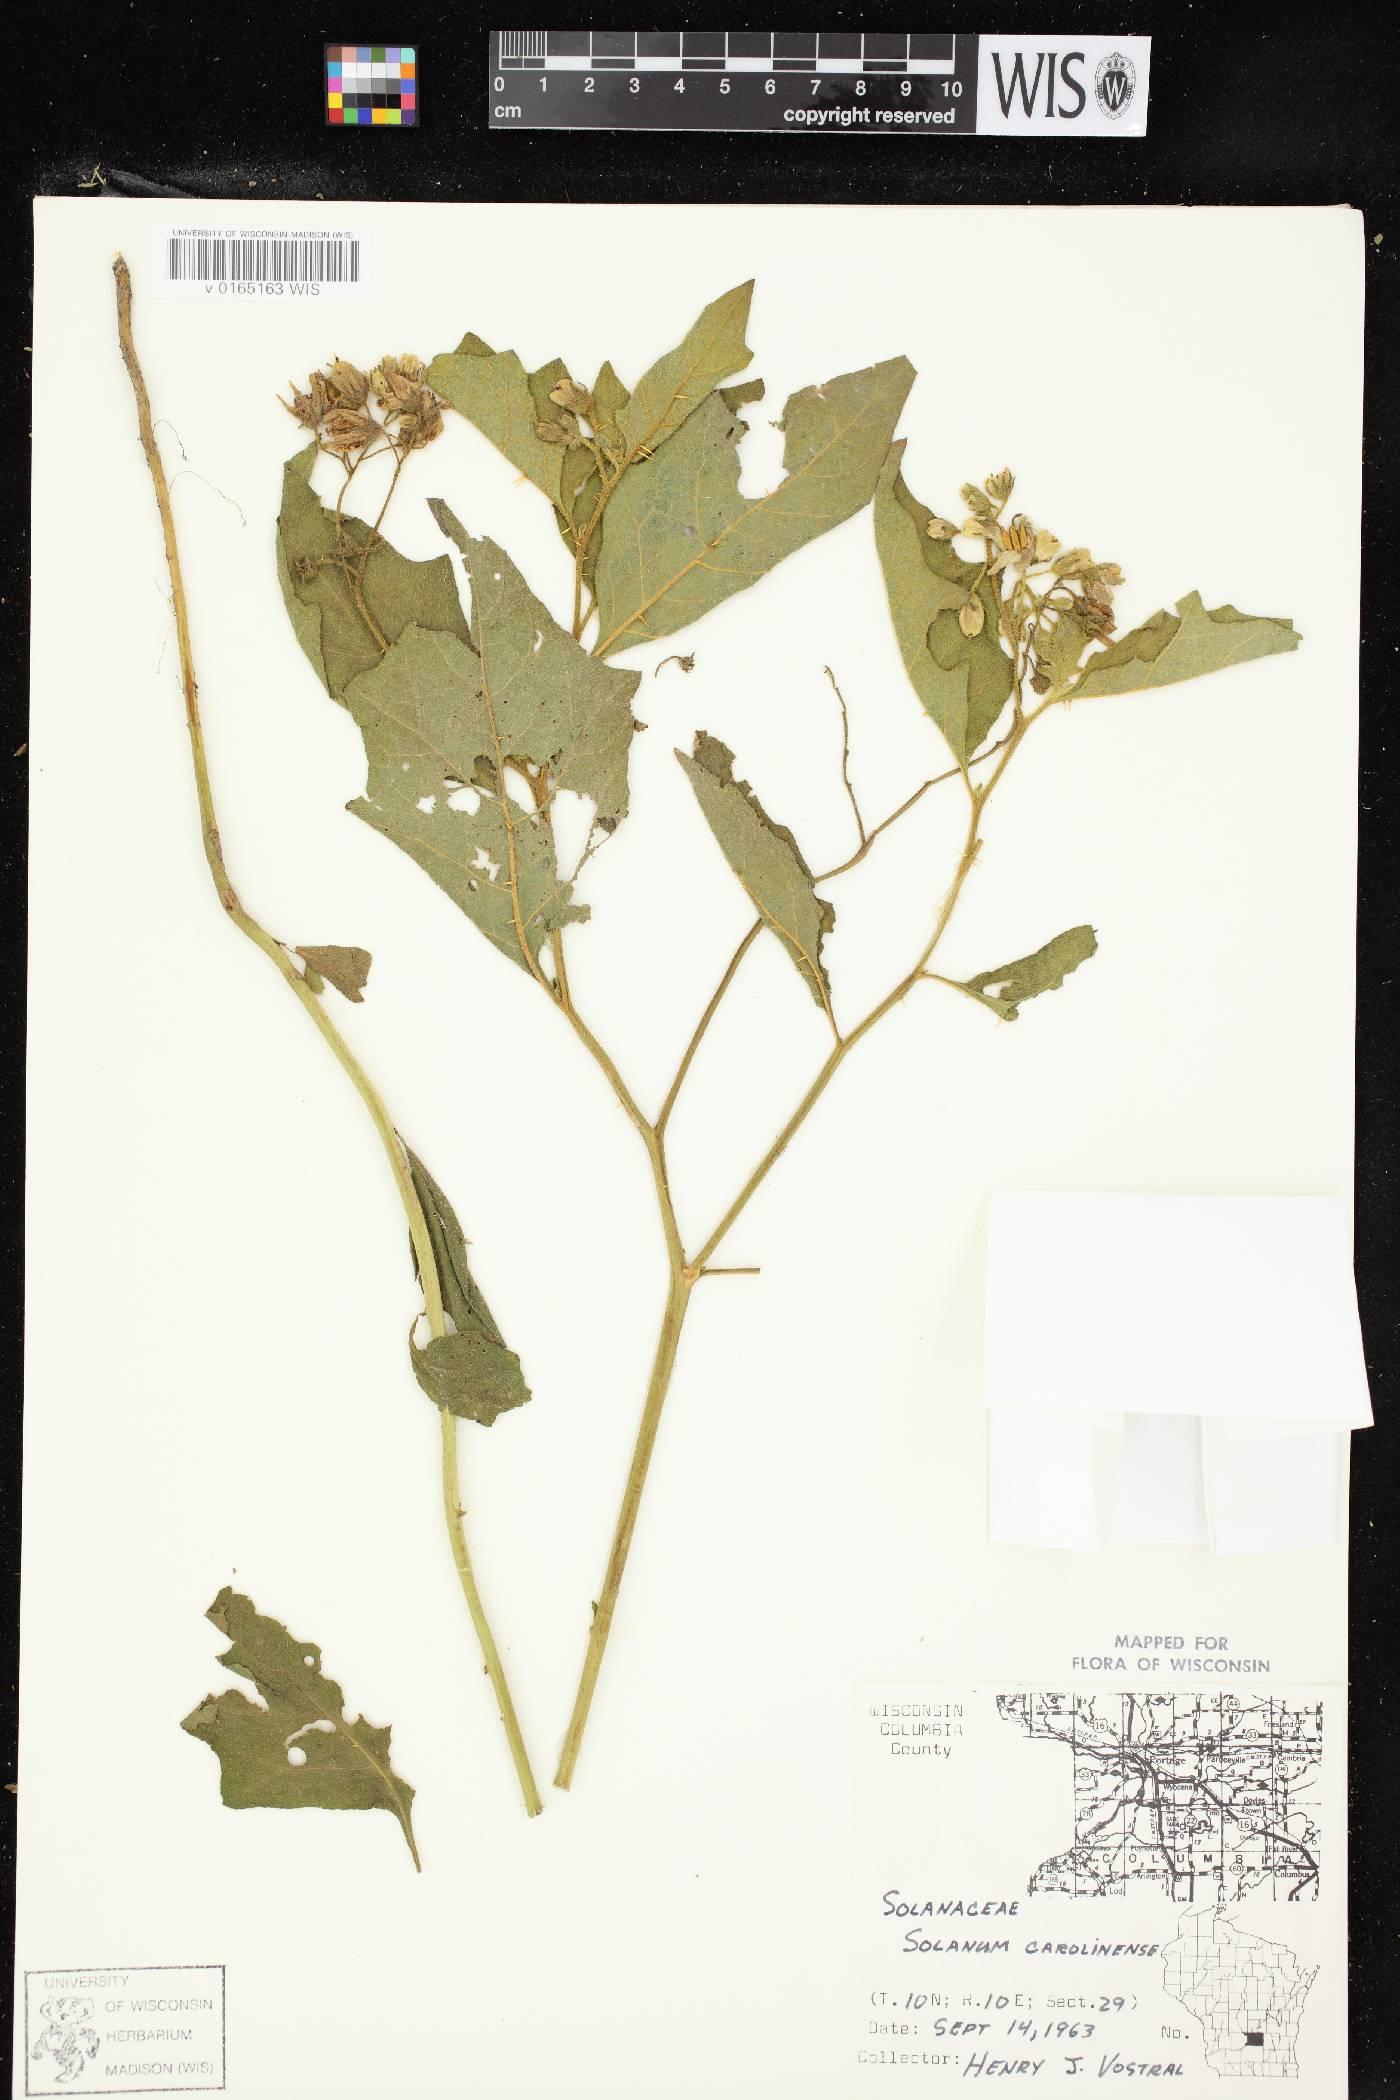 Solanum carolinense var. carolinense image